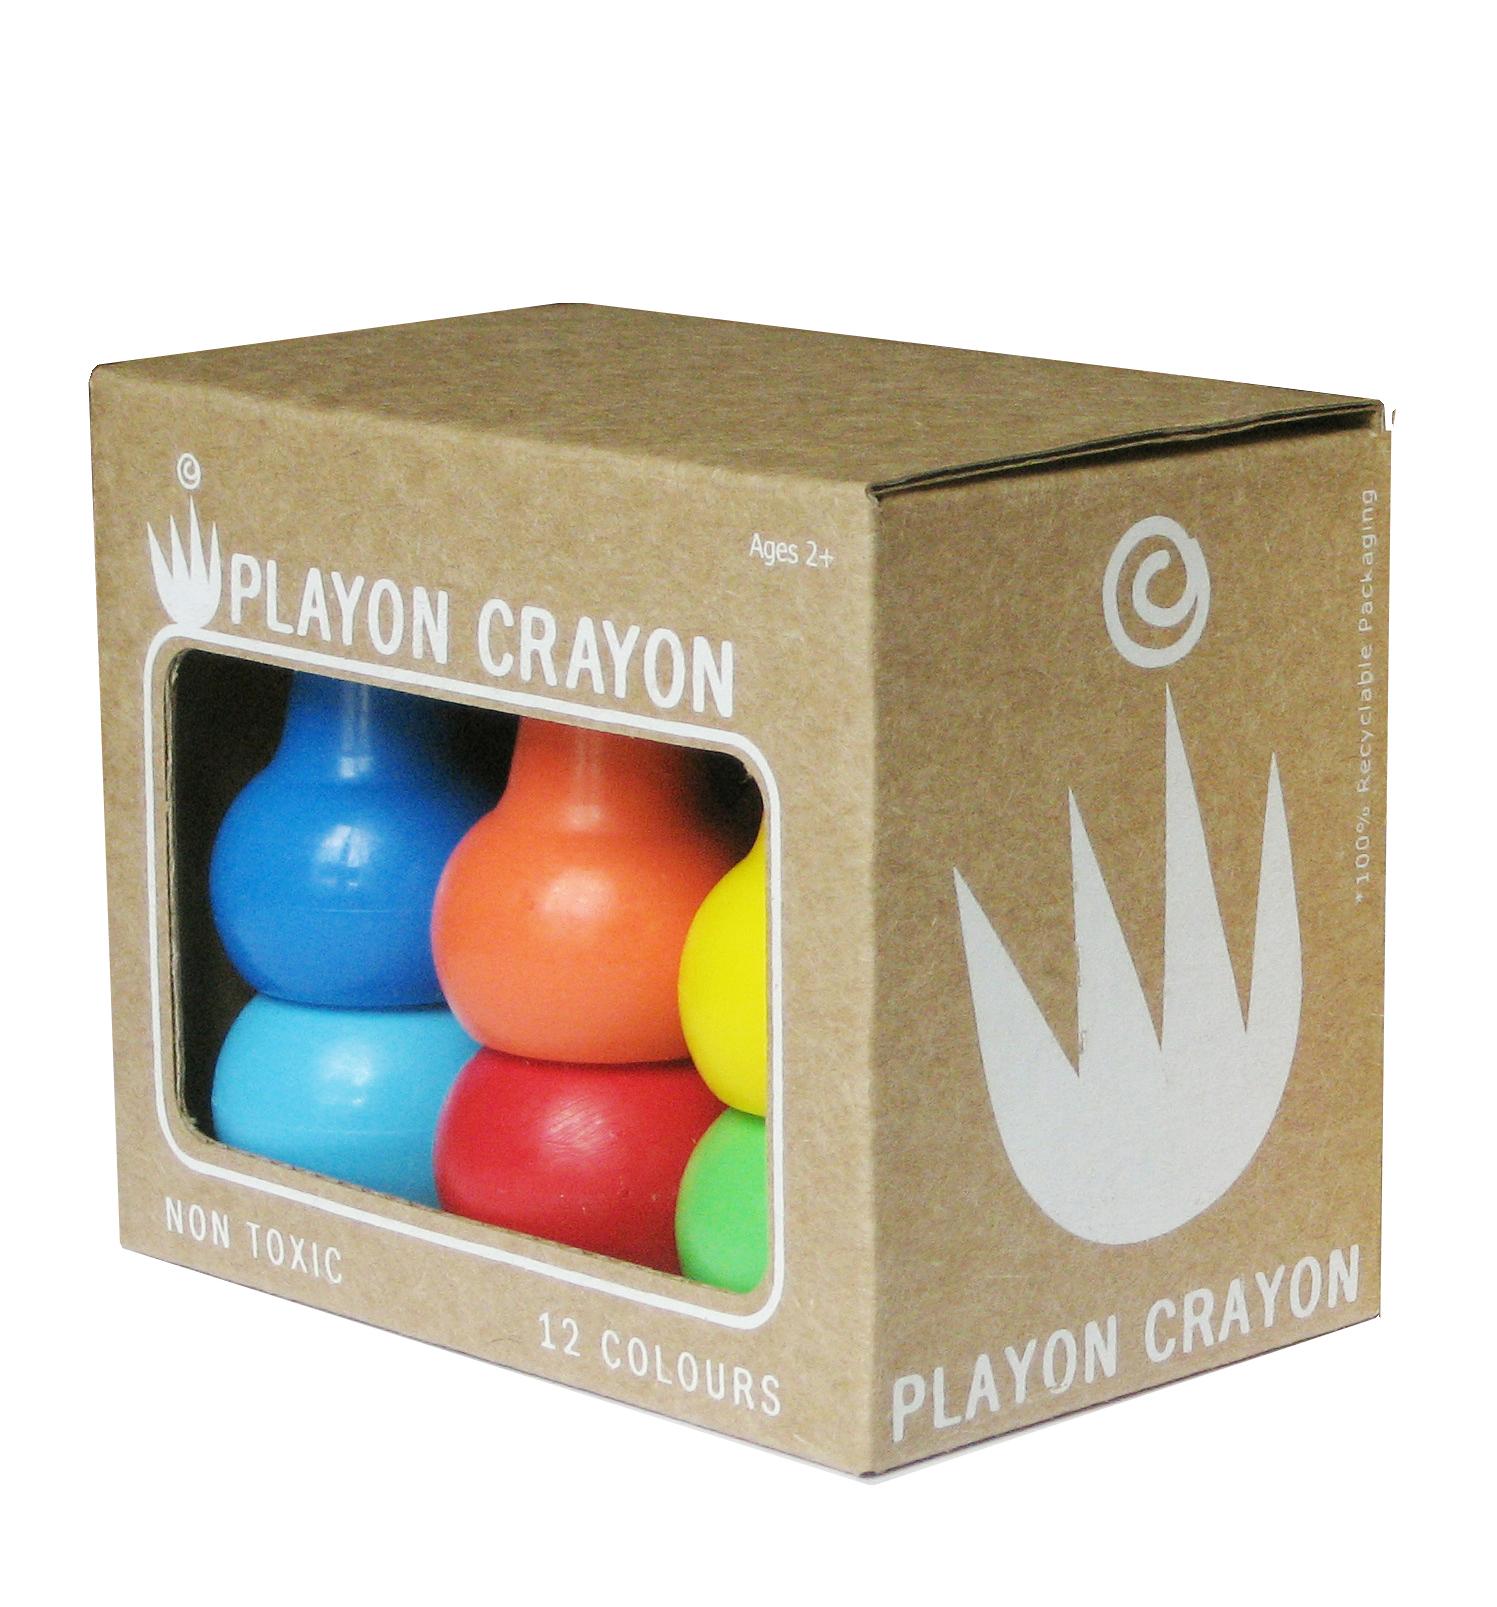 PLAYON CRAYON - PRIMARY